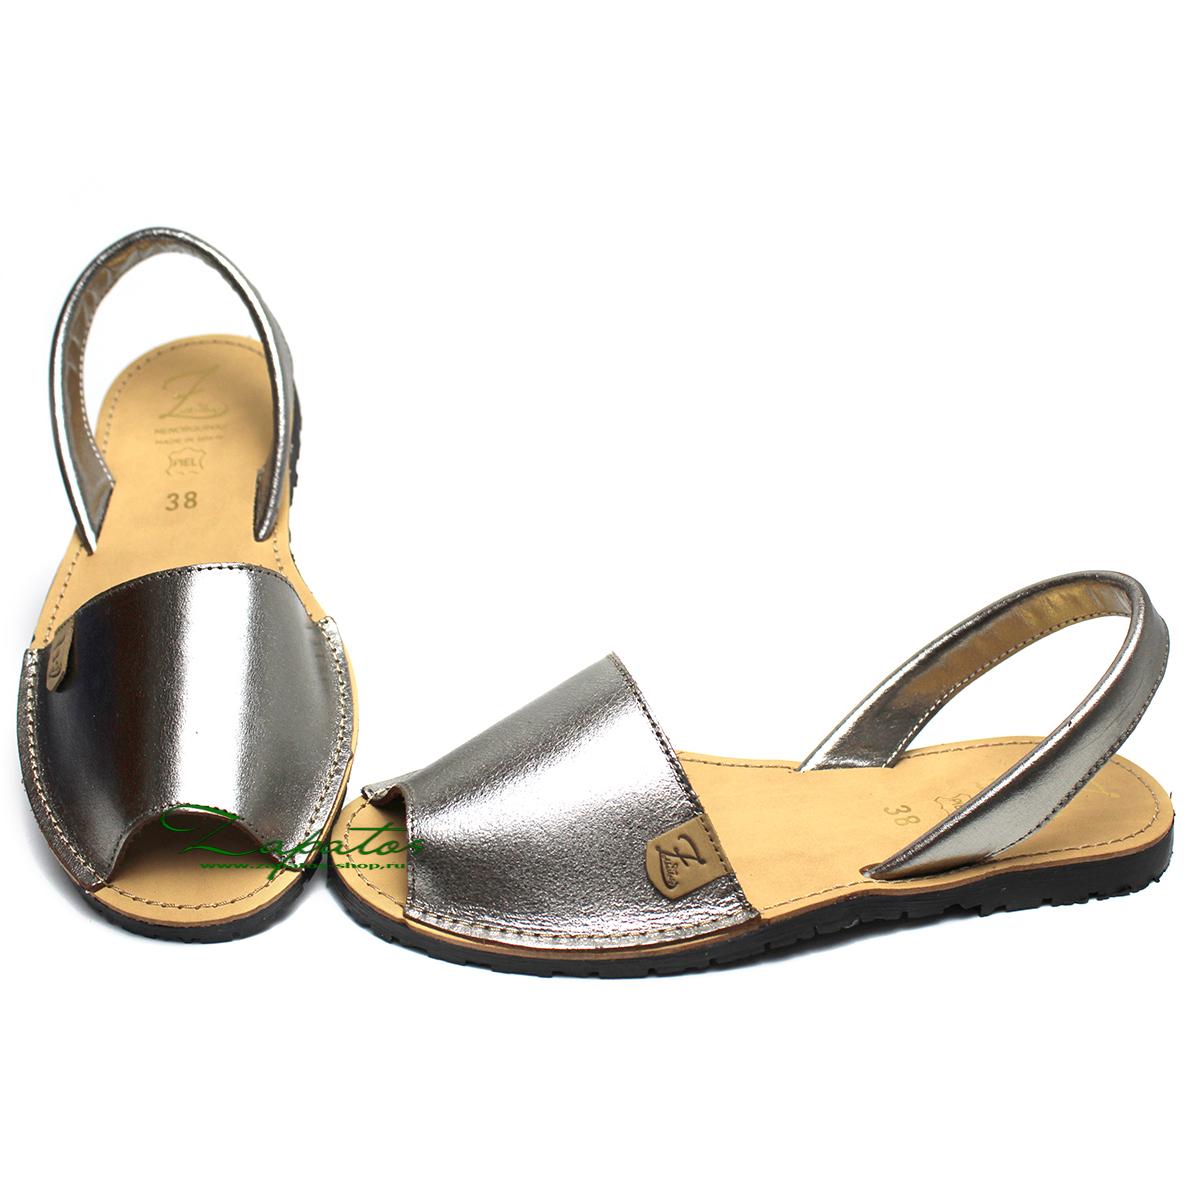 Абаркасы AB. Zapatos 3204 plata